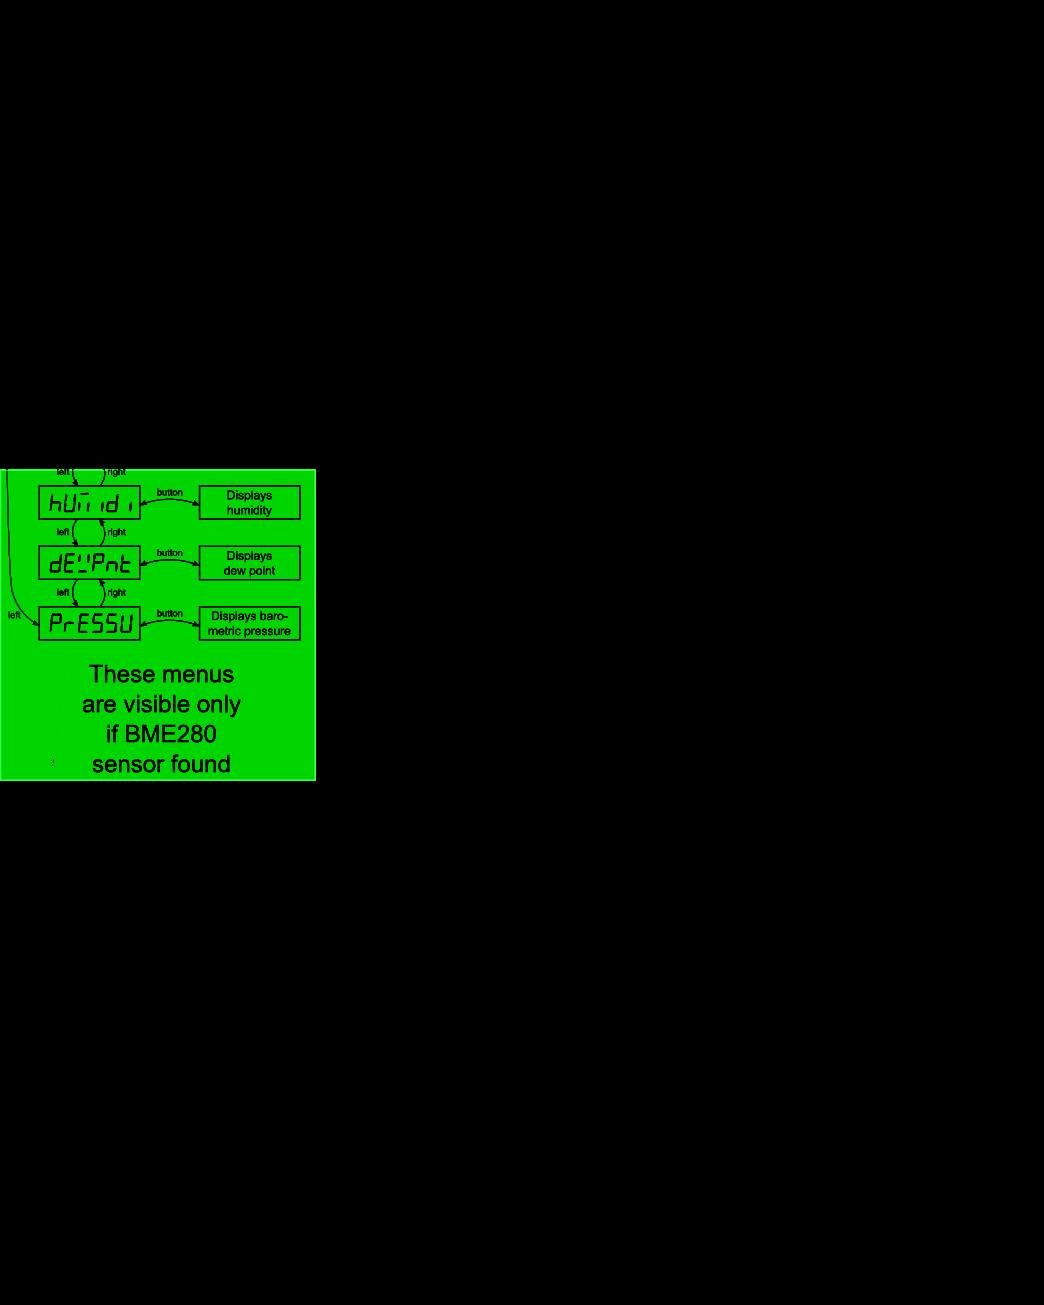 Kello v4 FW v1.00 menu diagram